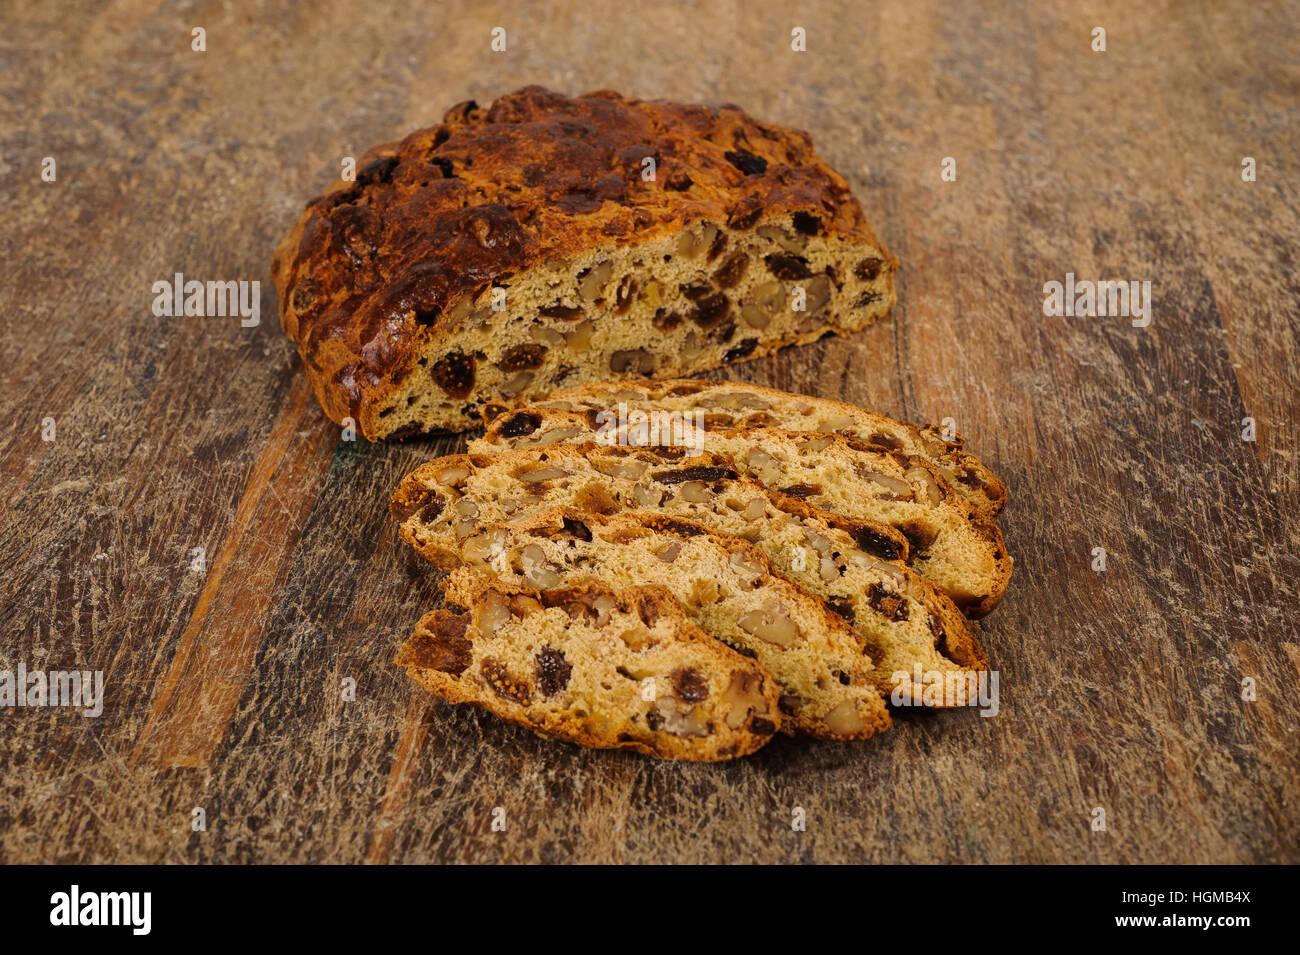 Bisciola,Typical cake Valtellina,Lombardia,Italy - Stock Image